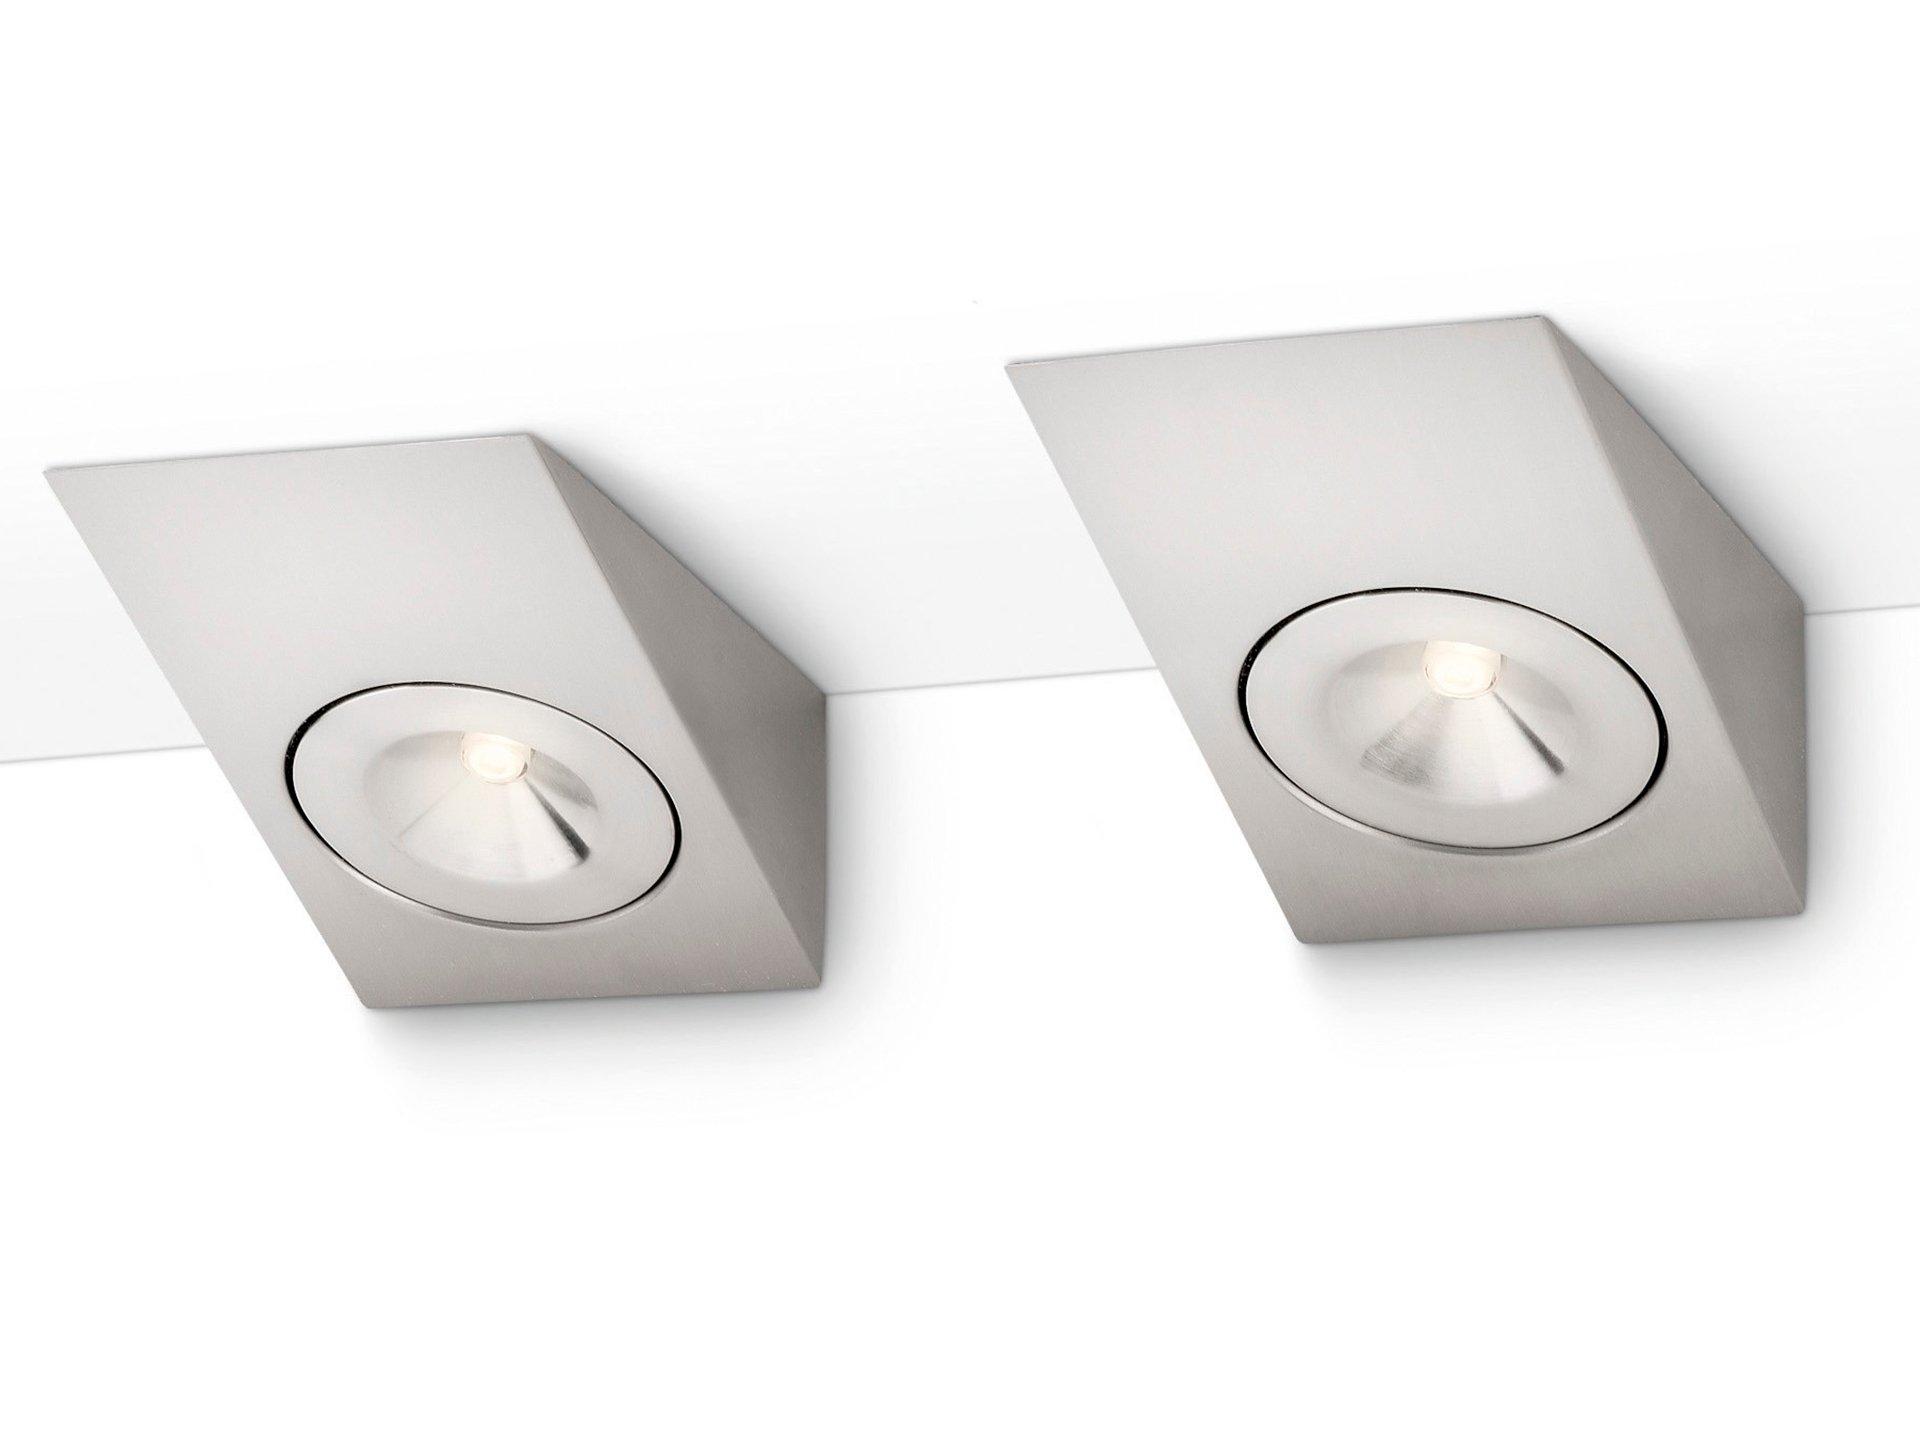 philips devine led keukenkast verlichting 2x25w 200lm chrome mat hubo